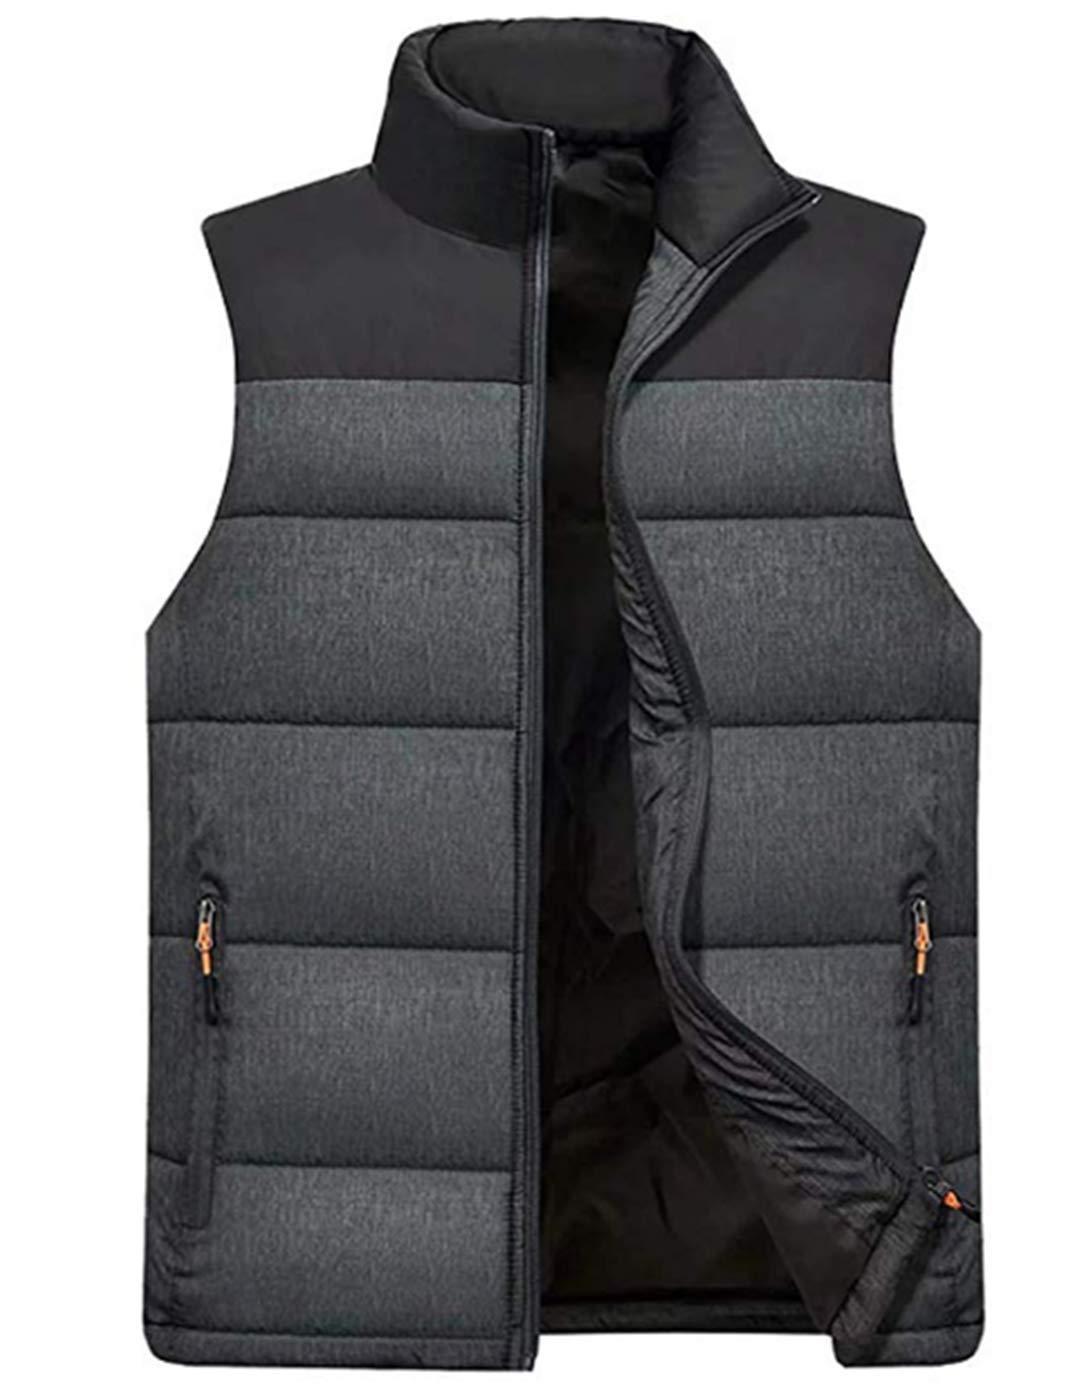 Vcansion Men's Stand Collar Lightweight Vest Casual Down Jacket Coat Vest Black+Dark Grey XL by Vcansion